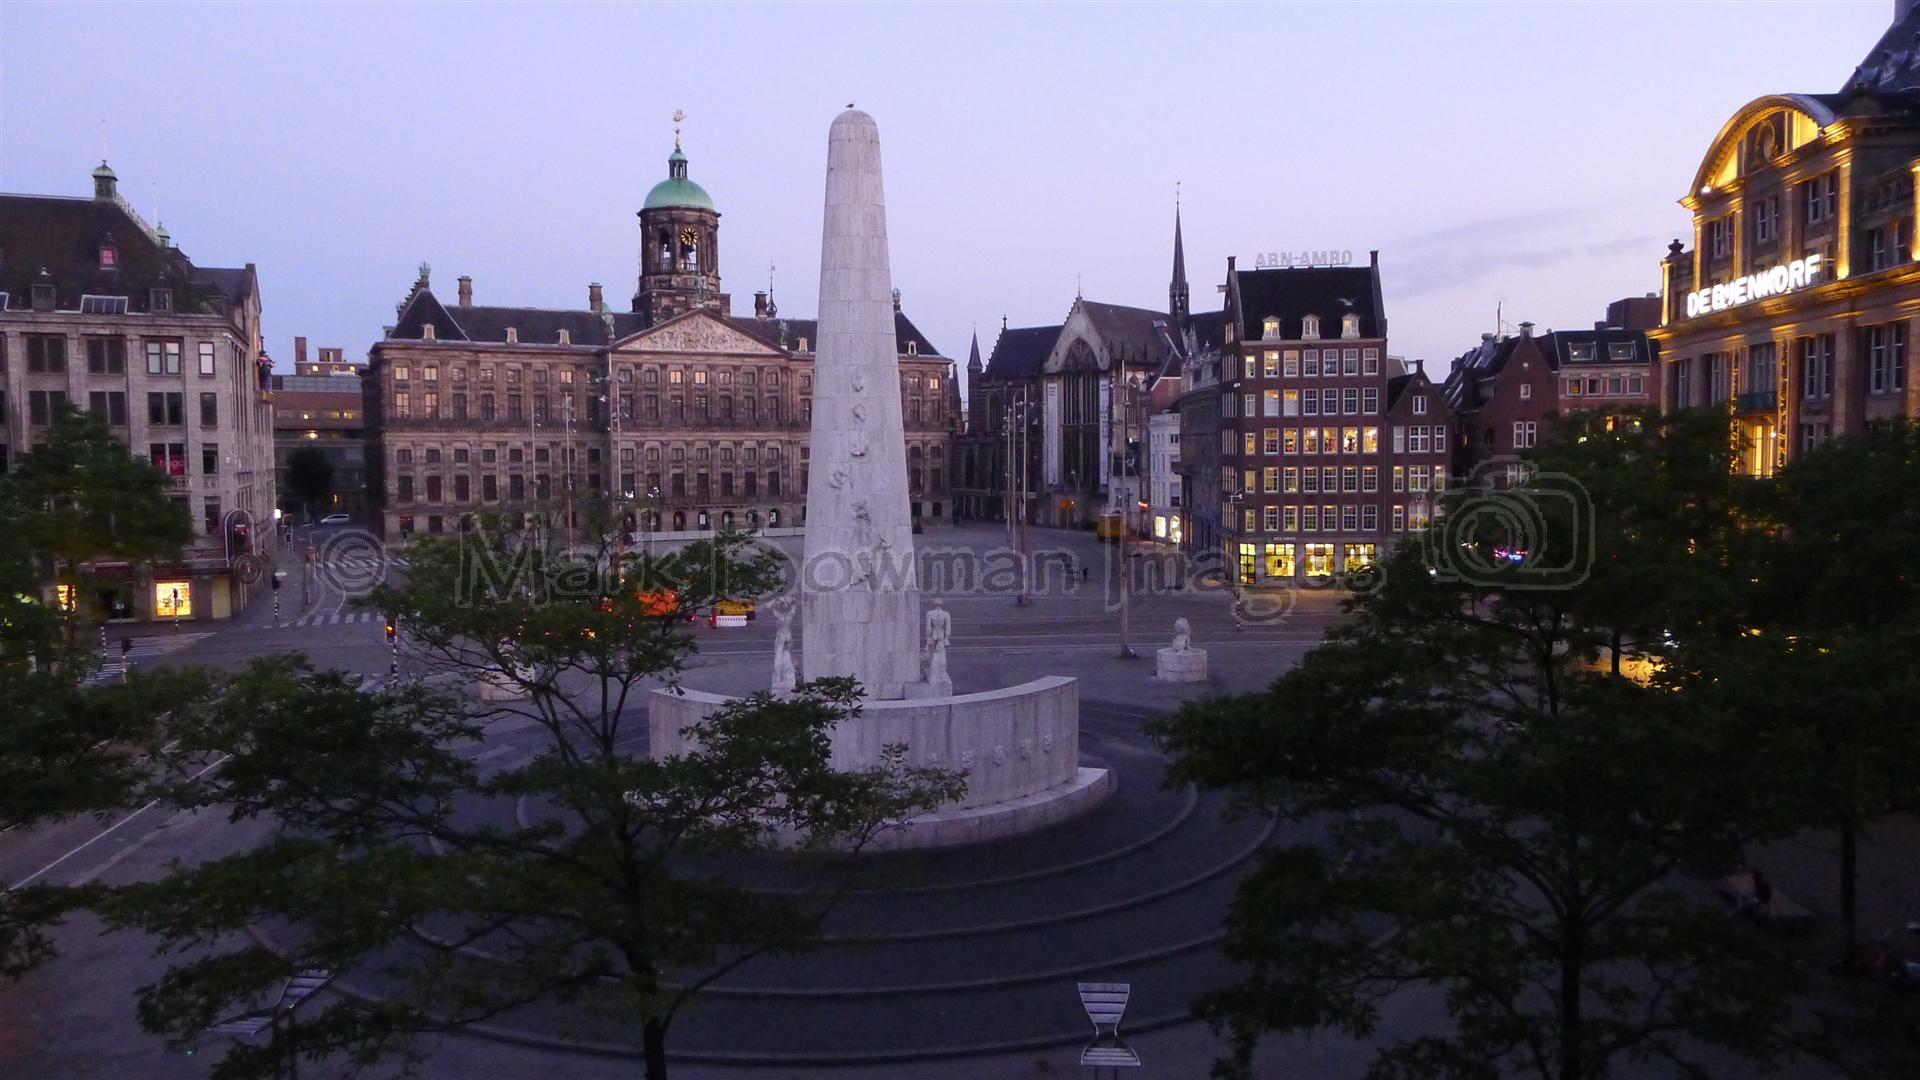 Amsterdam dam square at dawn mark bowman images for Ostello amsterdam piazza dam